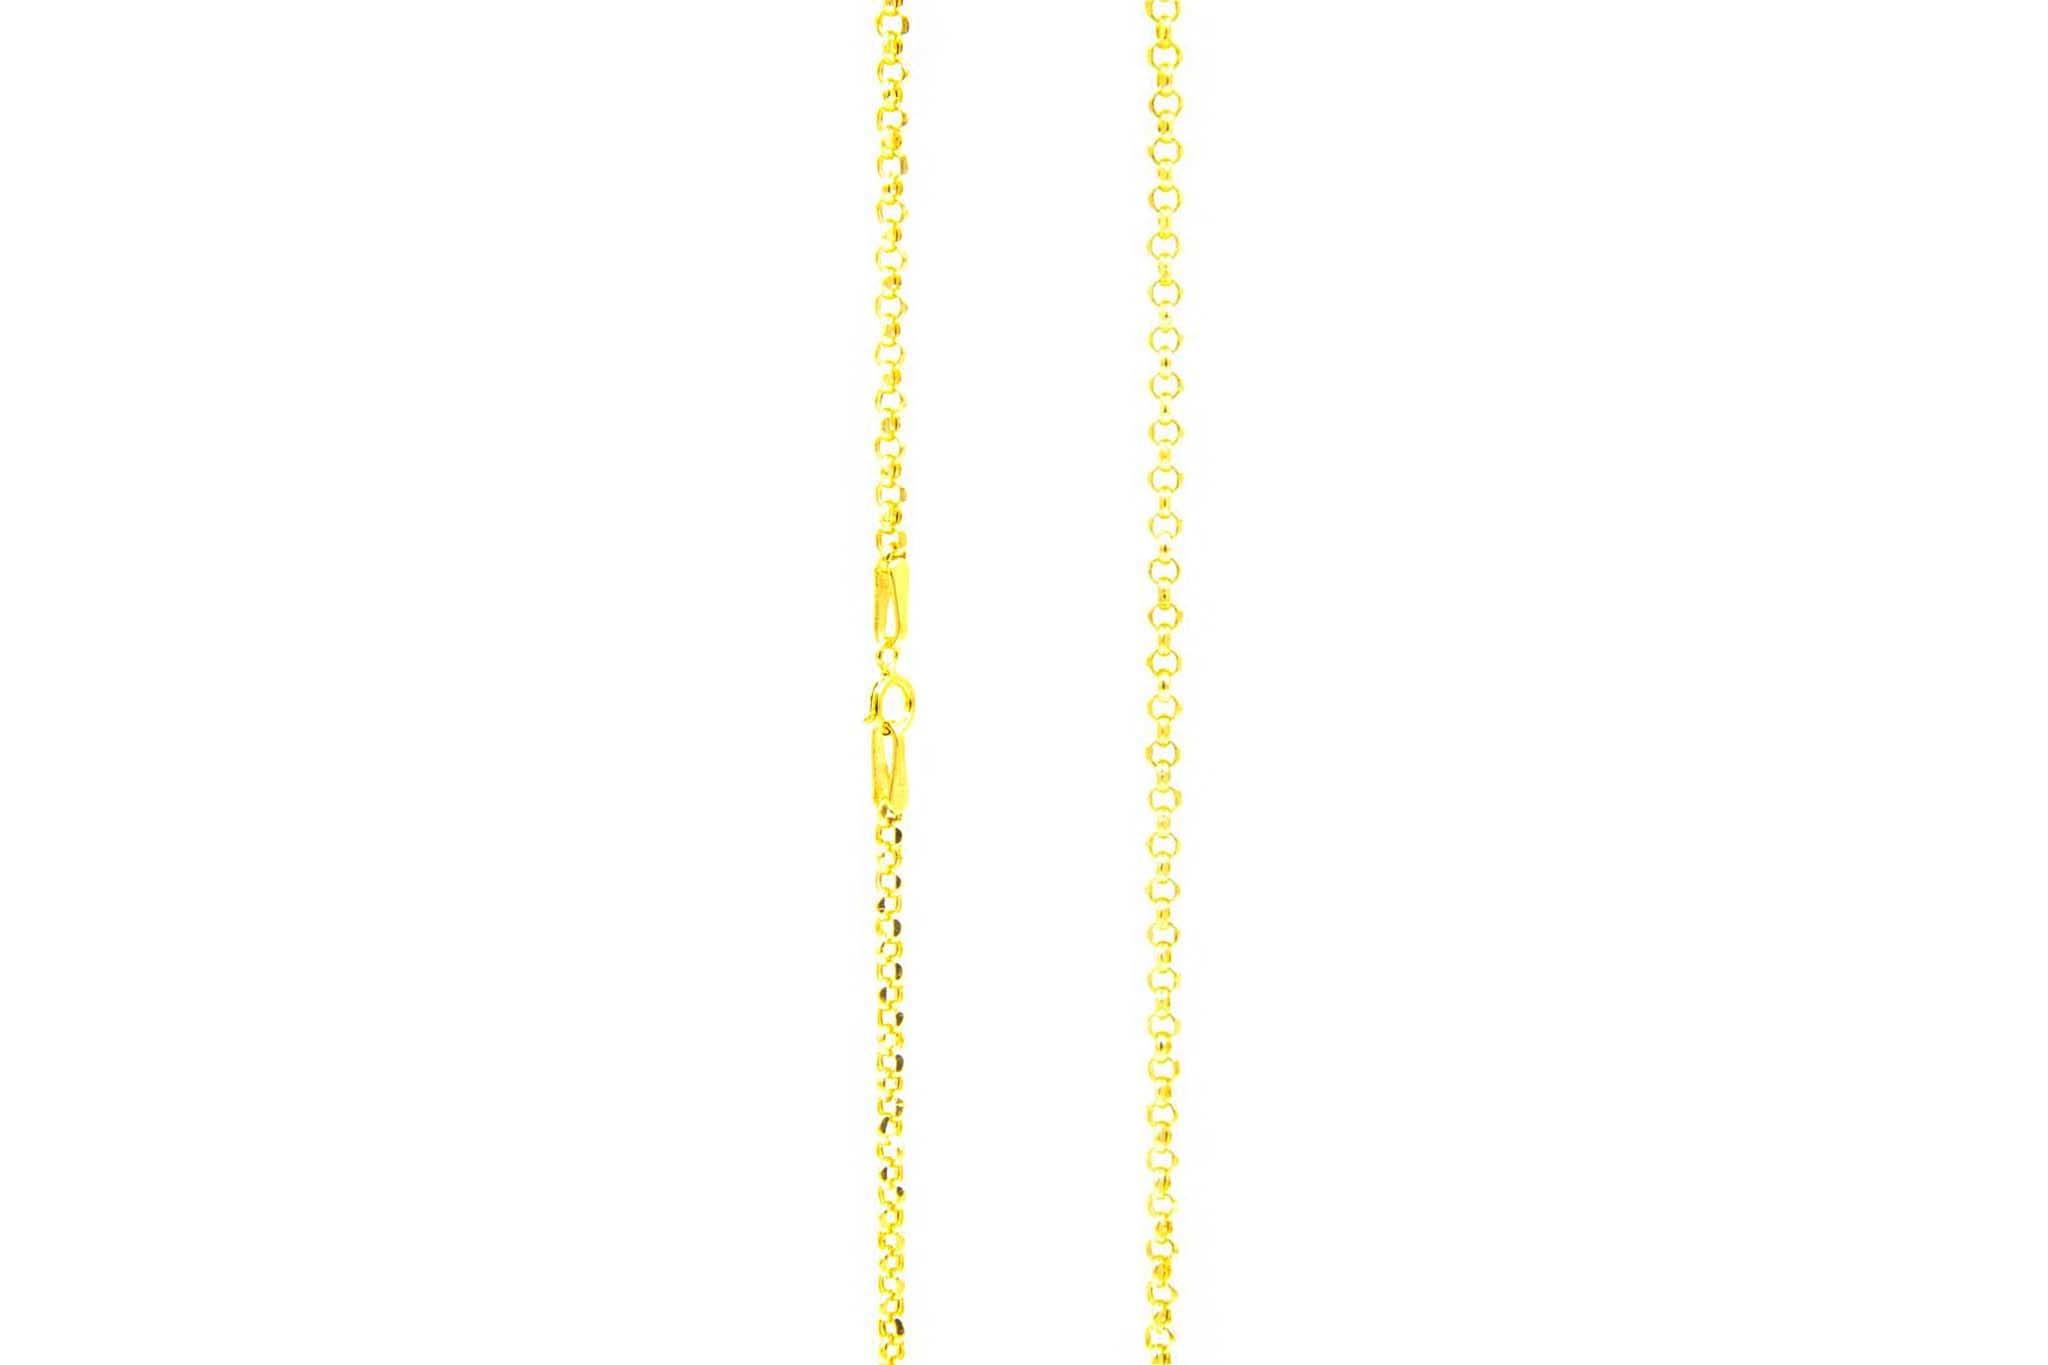 Ketting anker schakel-1